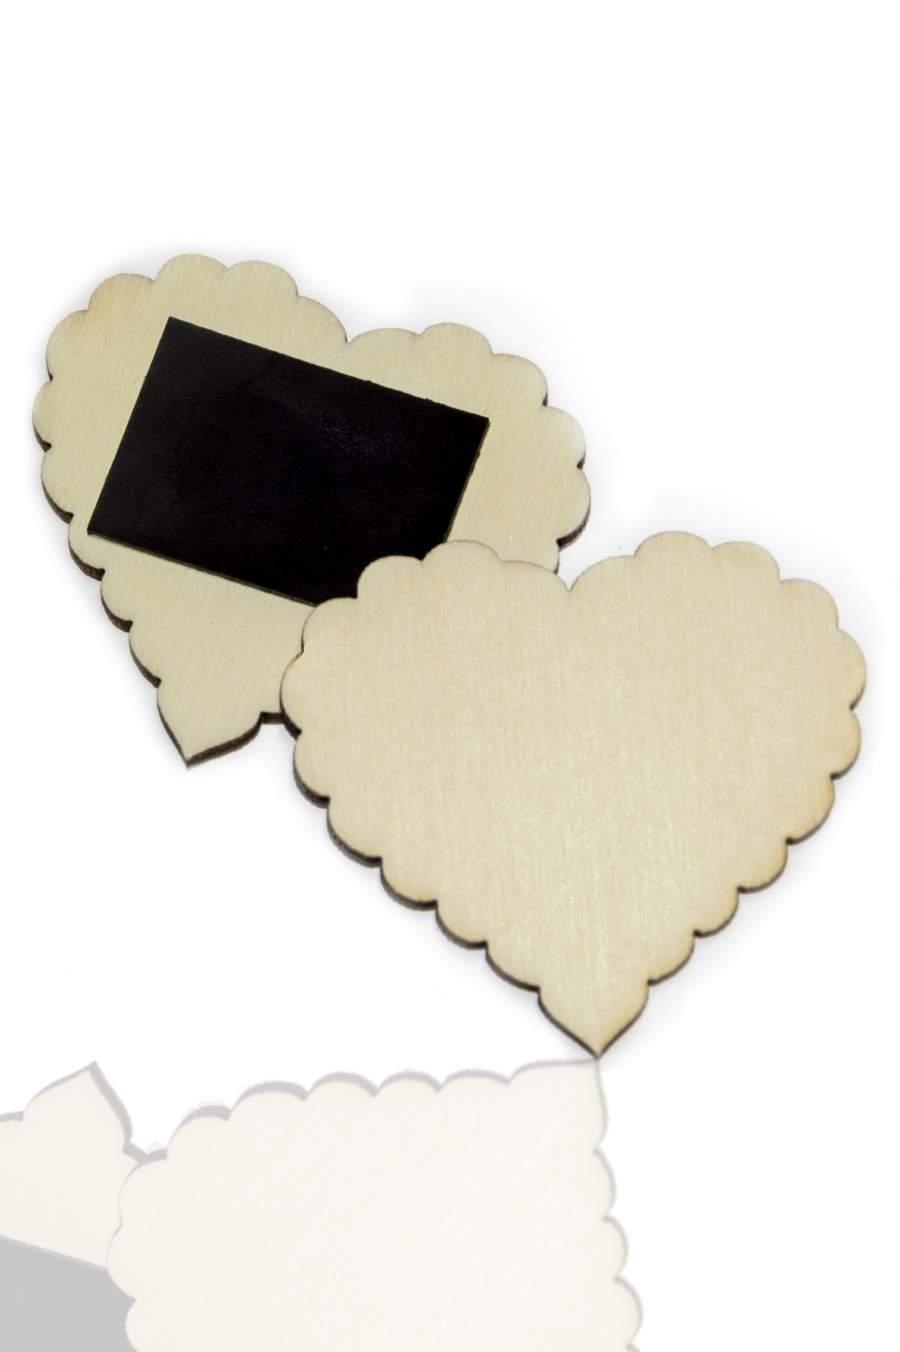 110. Drevená magnetka na chladničku – základný materiál 50x45mm